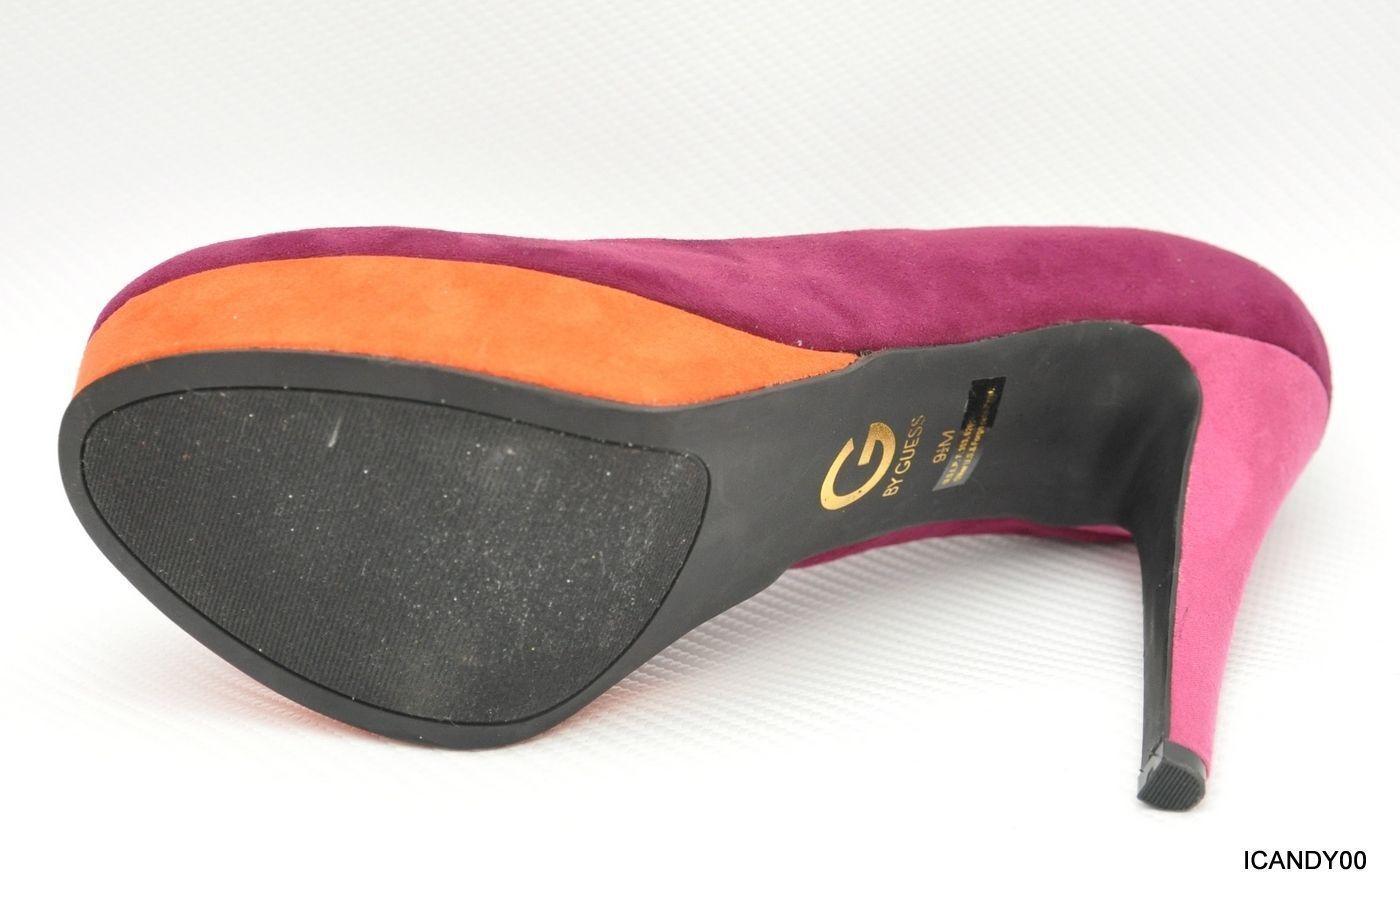 Nib G by Guess VABII Round Toe Suede Suede Suede Platform Pump Heel shoes Pink orange 9.5 d087db